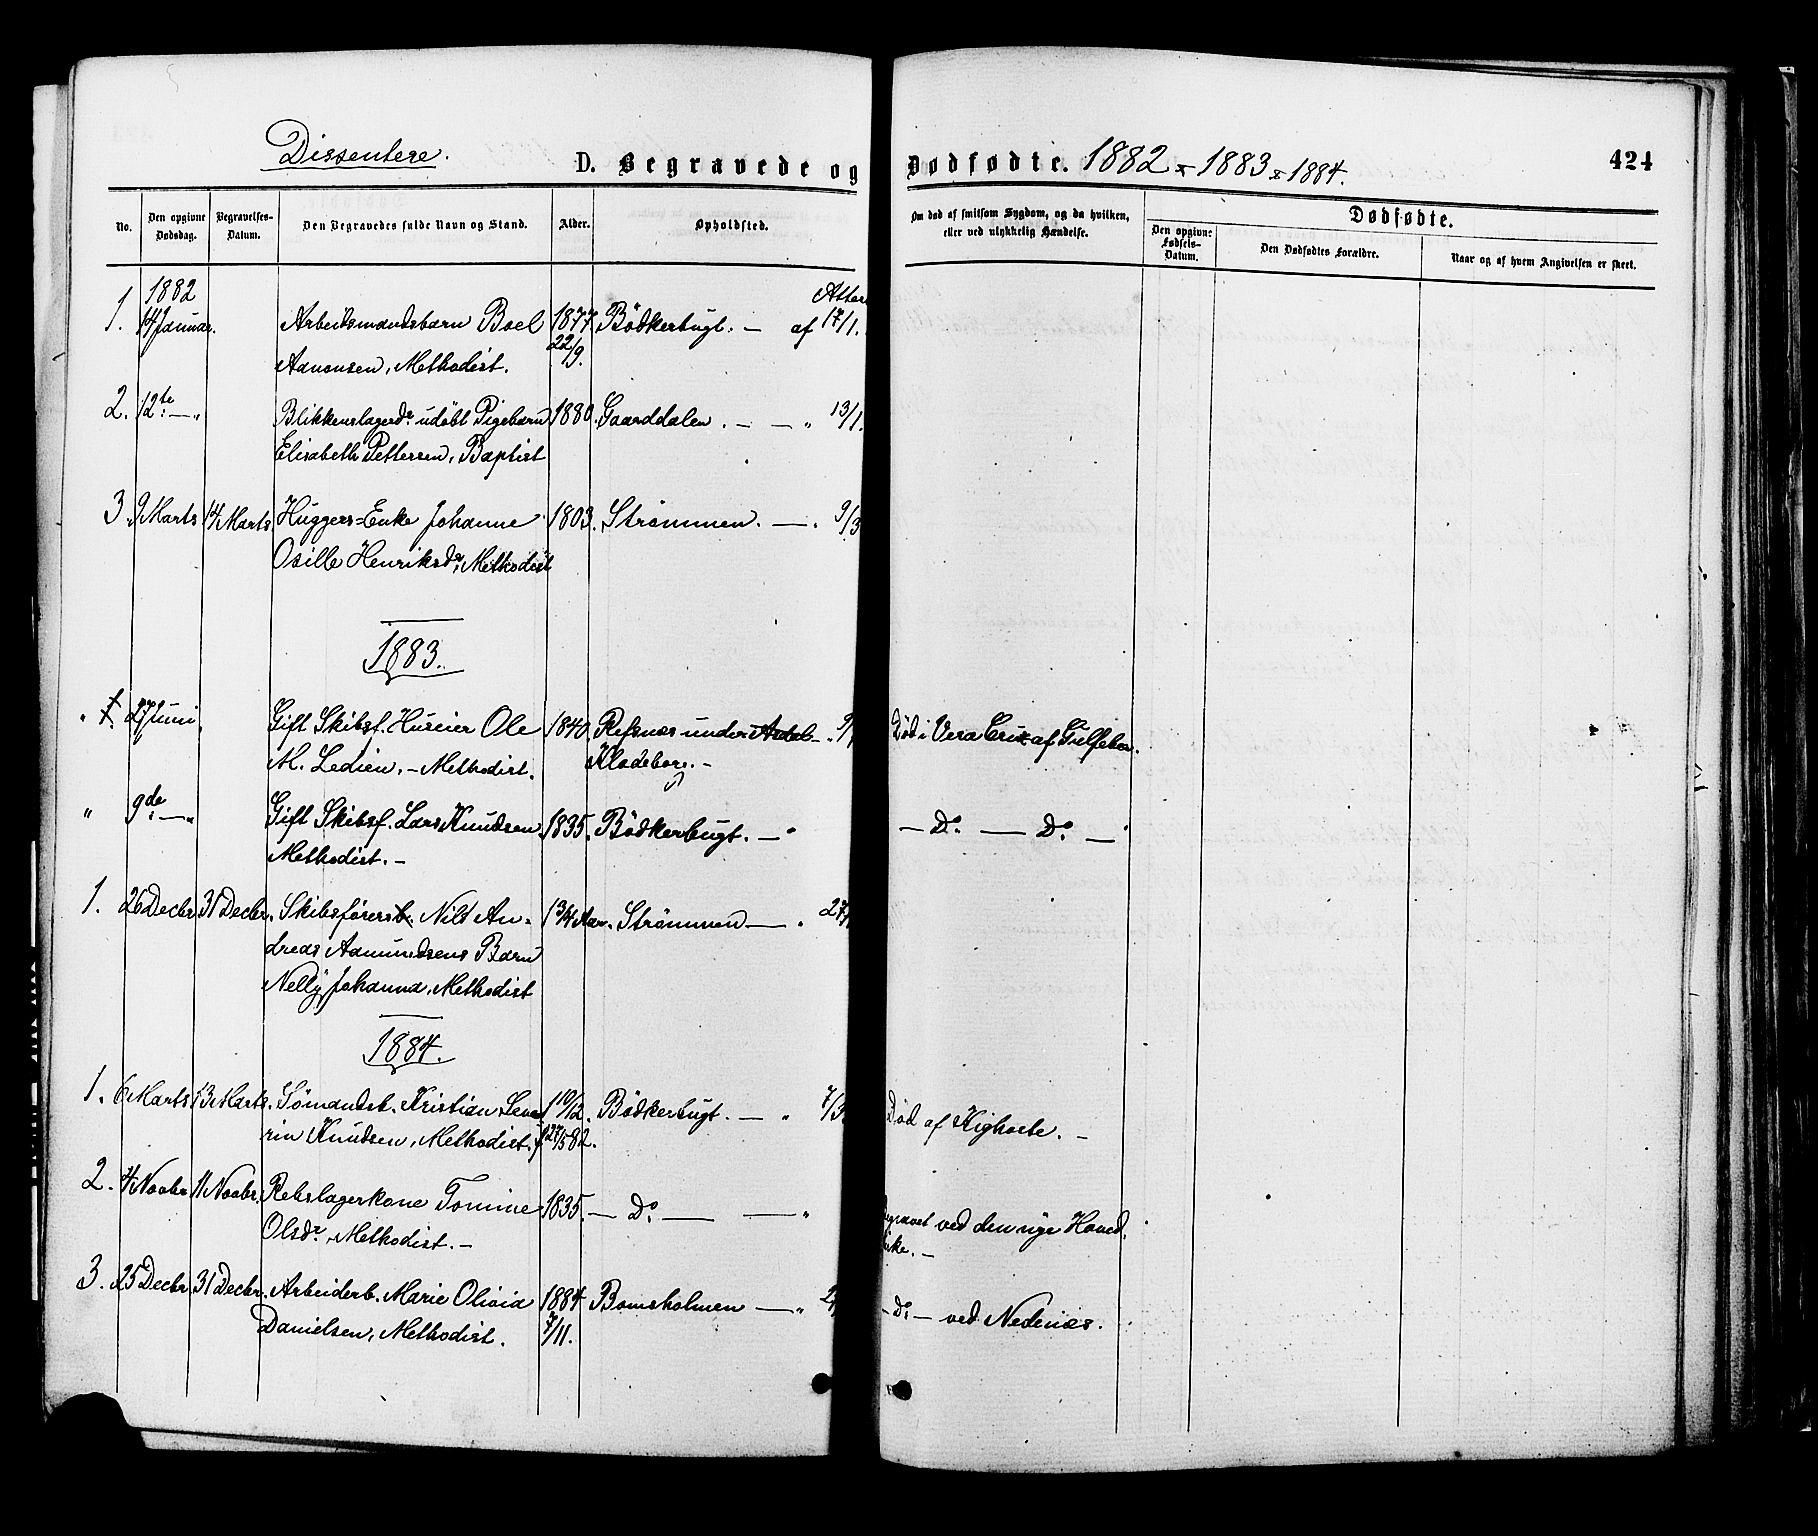 SAK, Øyestad sokneprestkontor, F/Fa/L0016: Ministerialbok nr. A 16, 1874-1886, s. 423